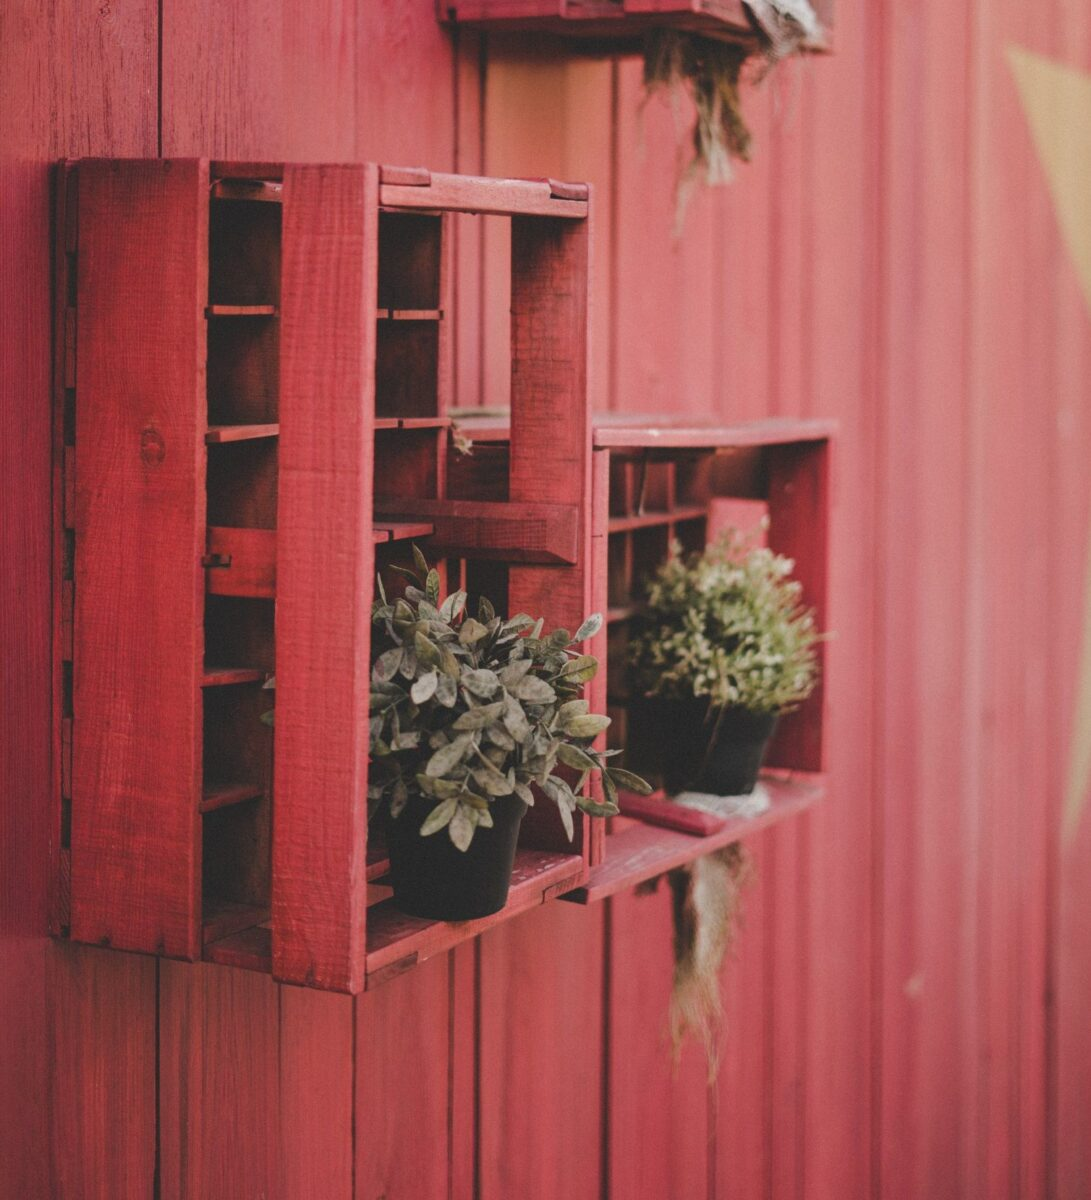 arredo-balcone-riciclo-4